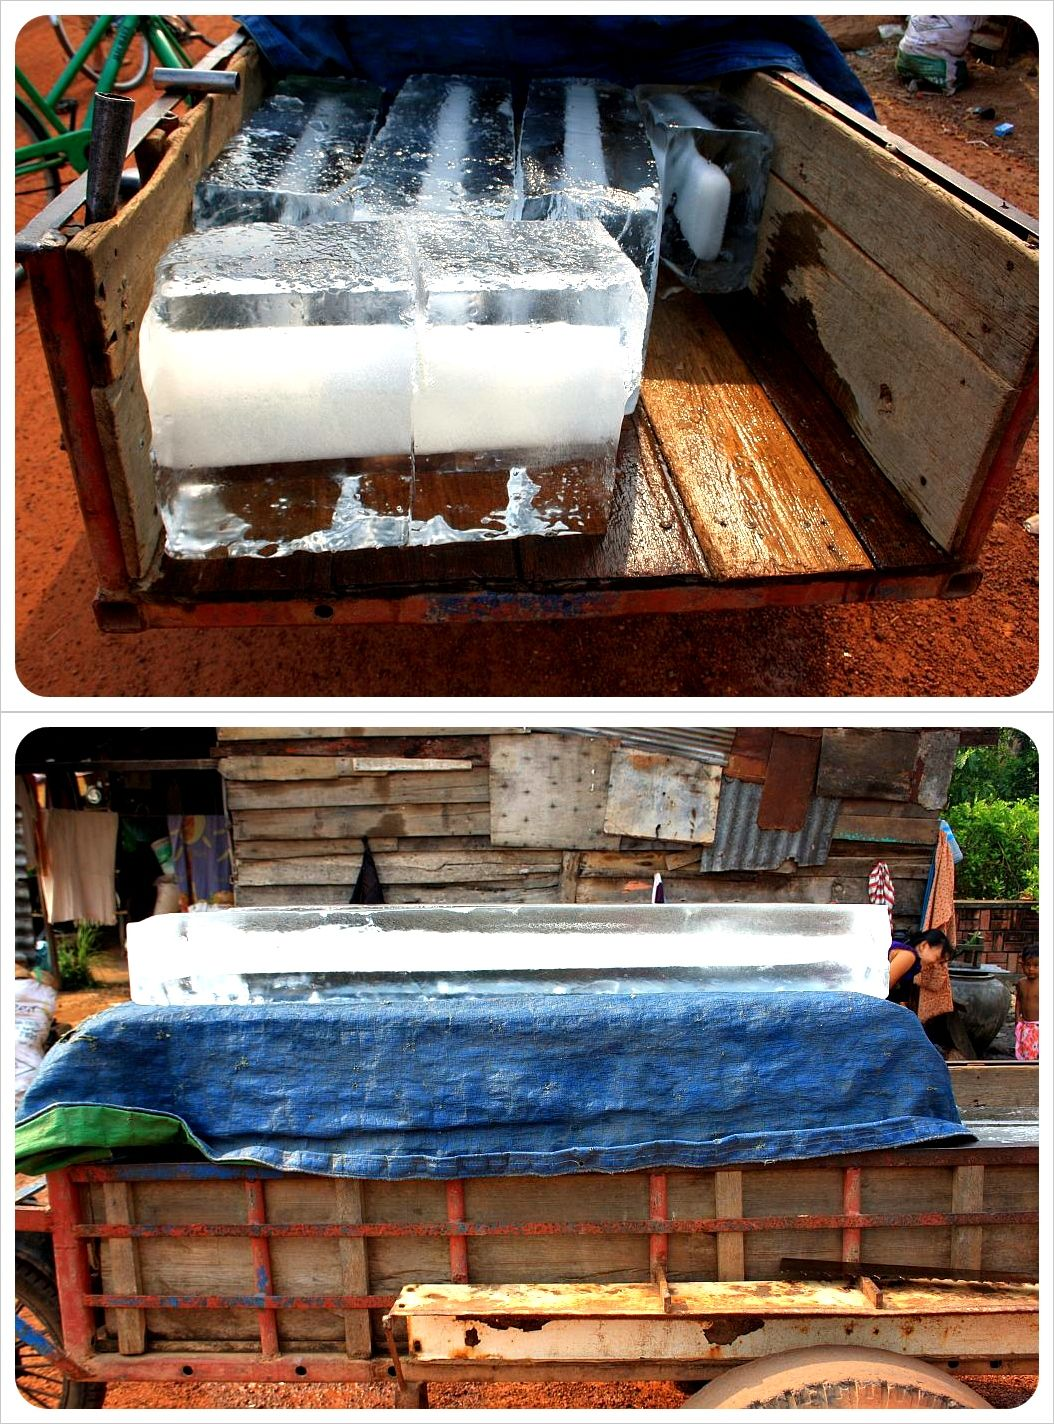 cambodian ice transport